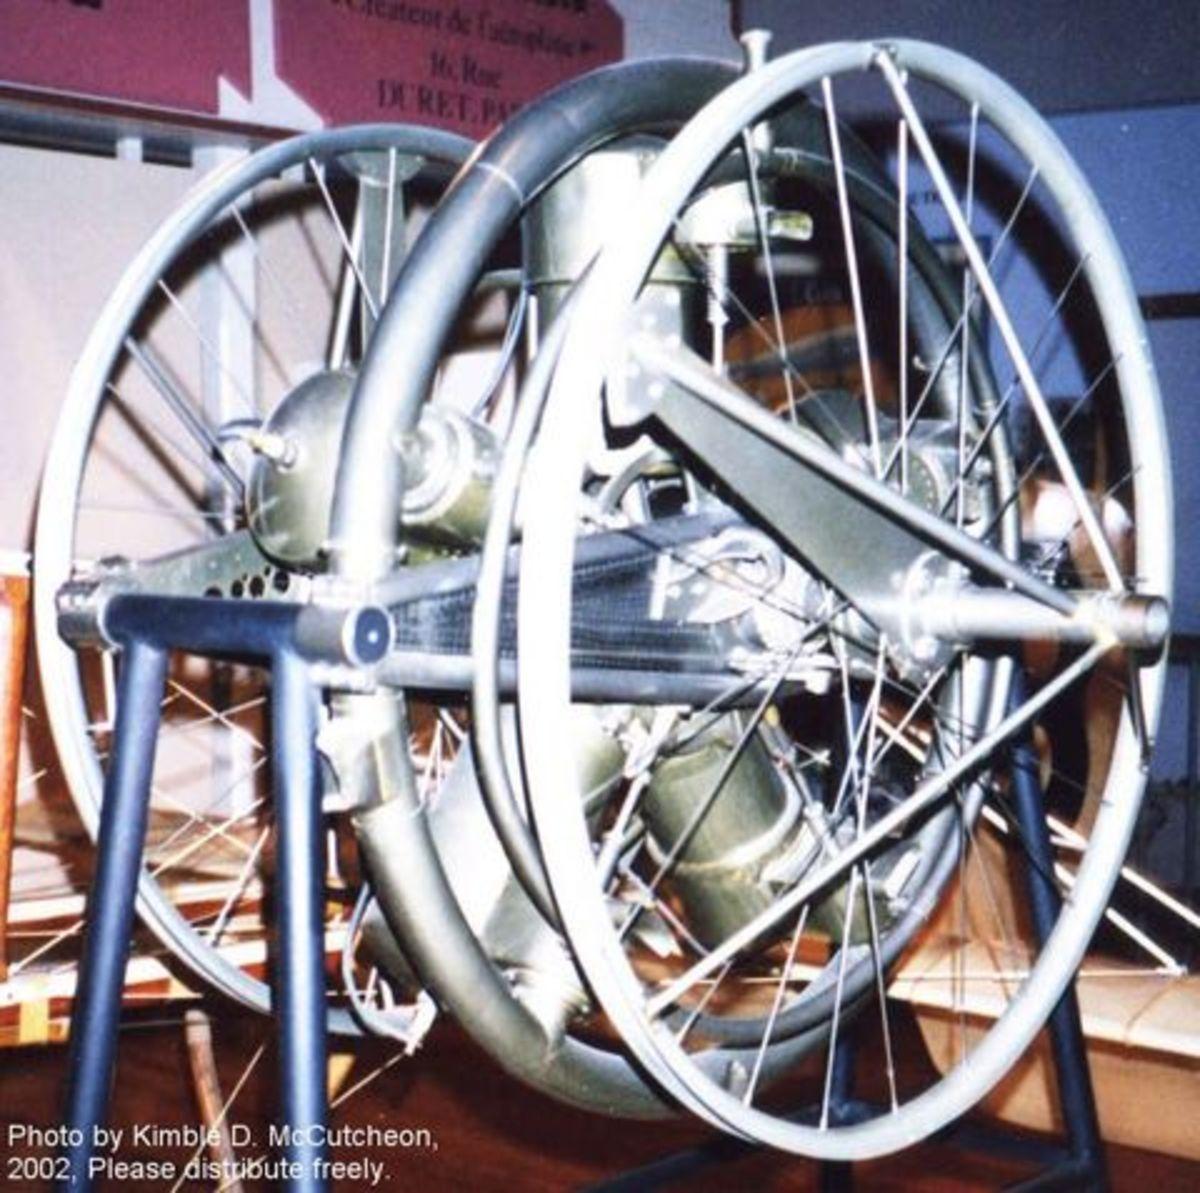 The Manley-Balzer engine. Photo courtesy of Kimbel McCutcheon.